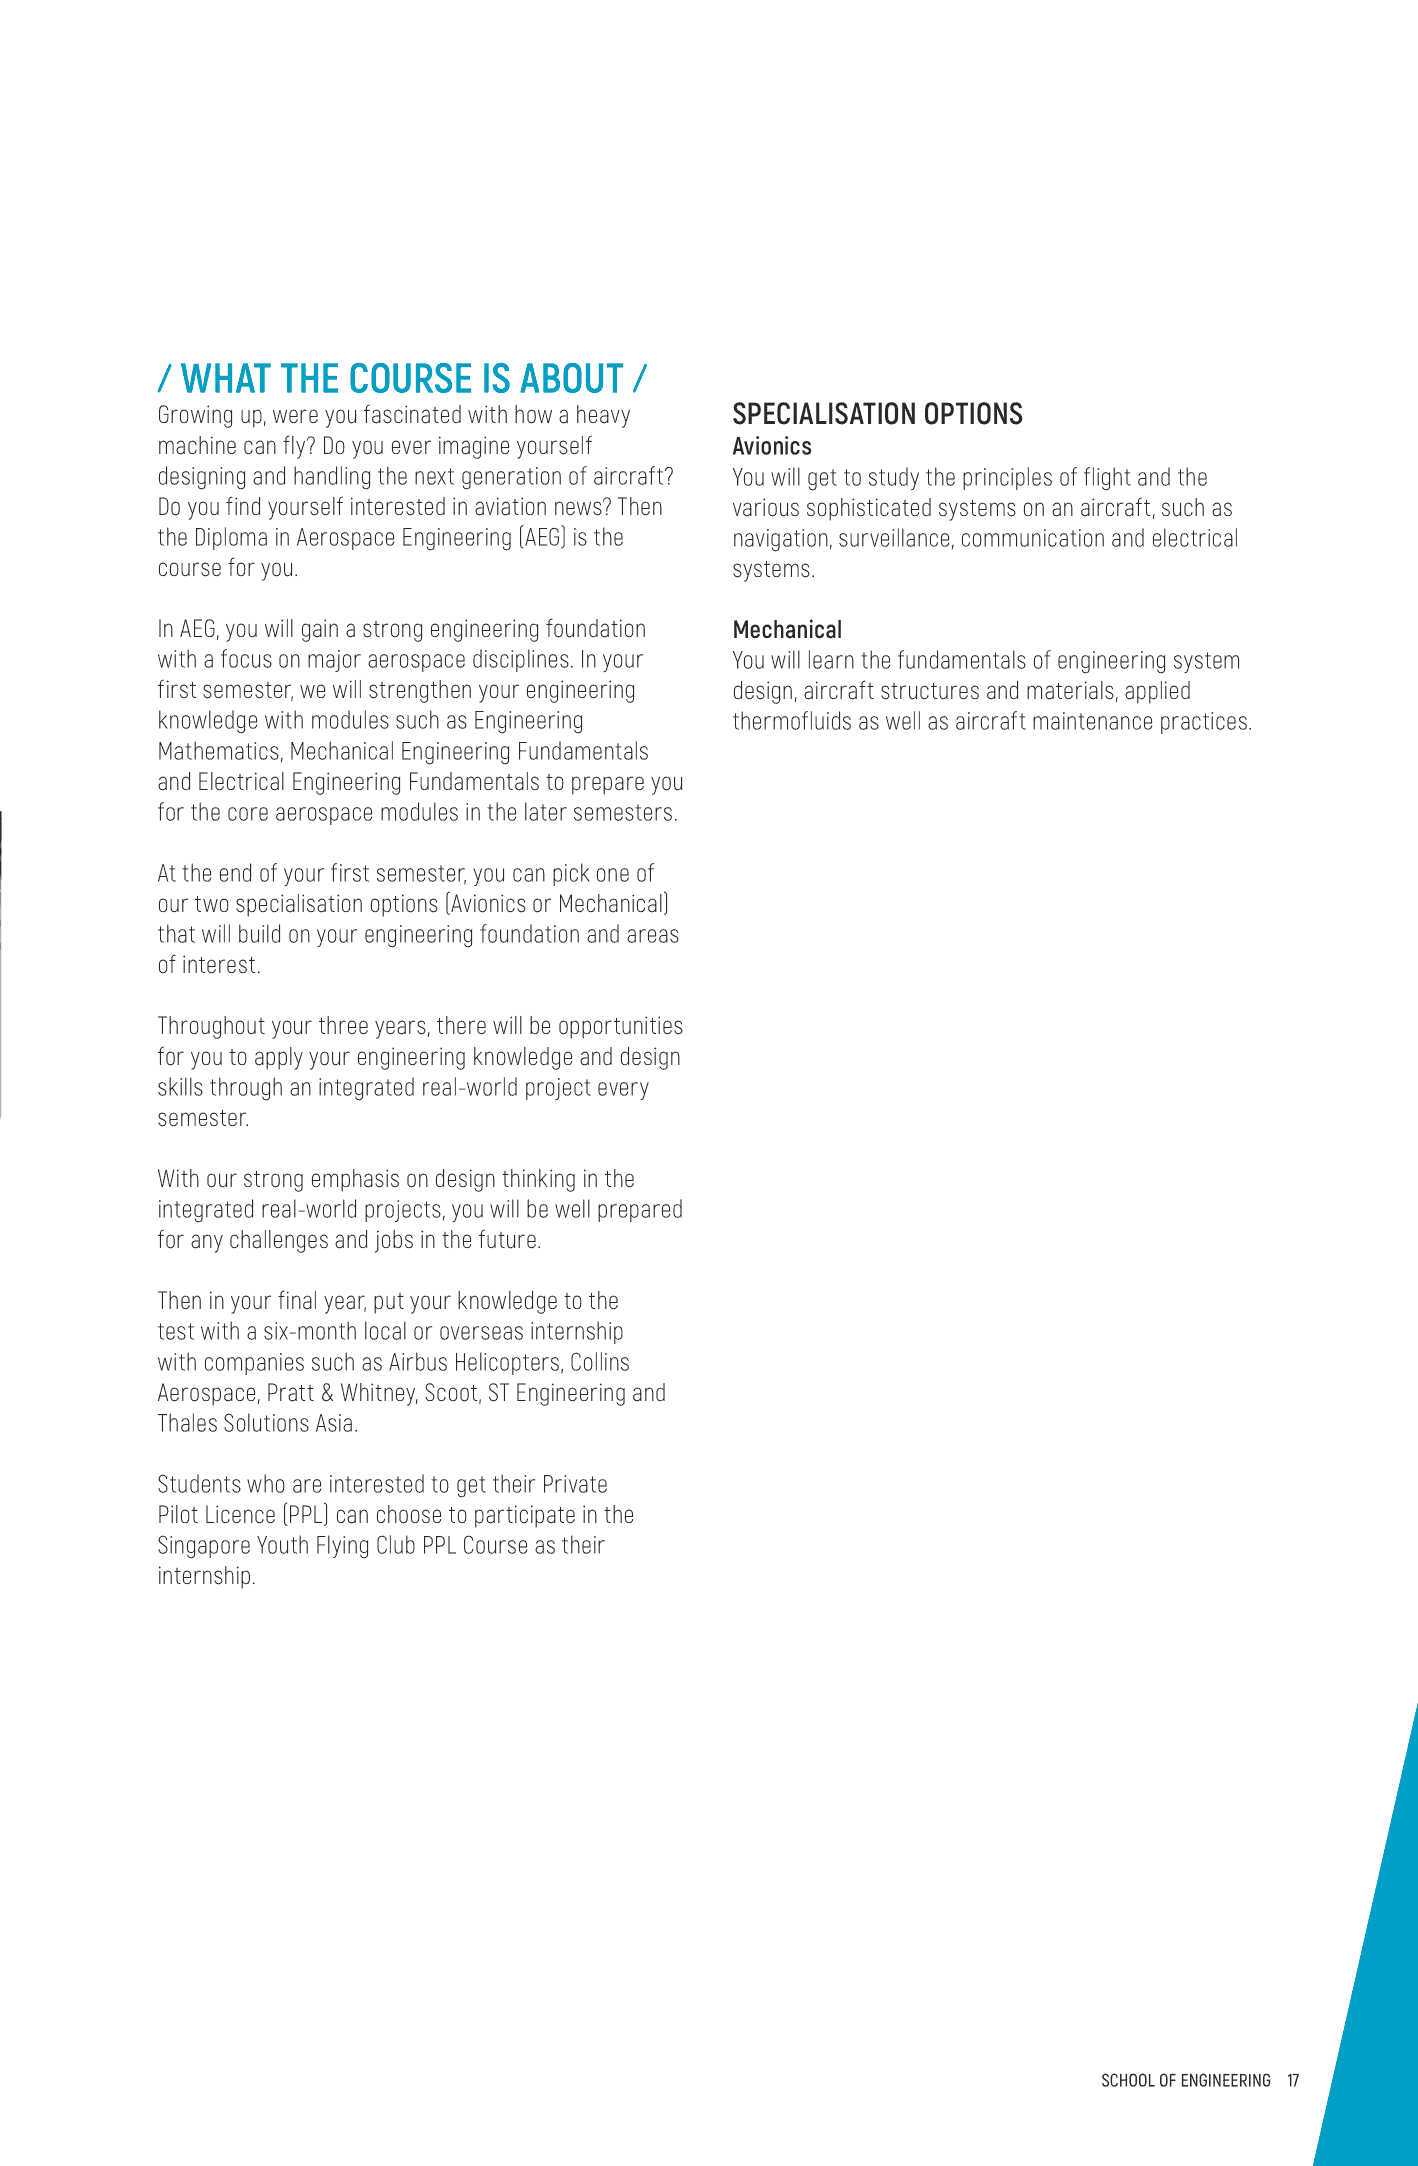 School of Engineering 2020-12